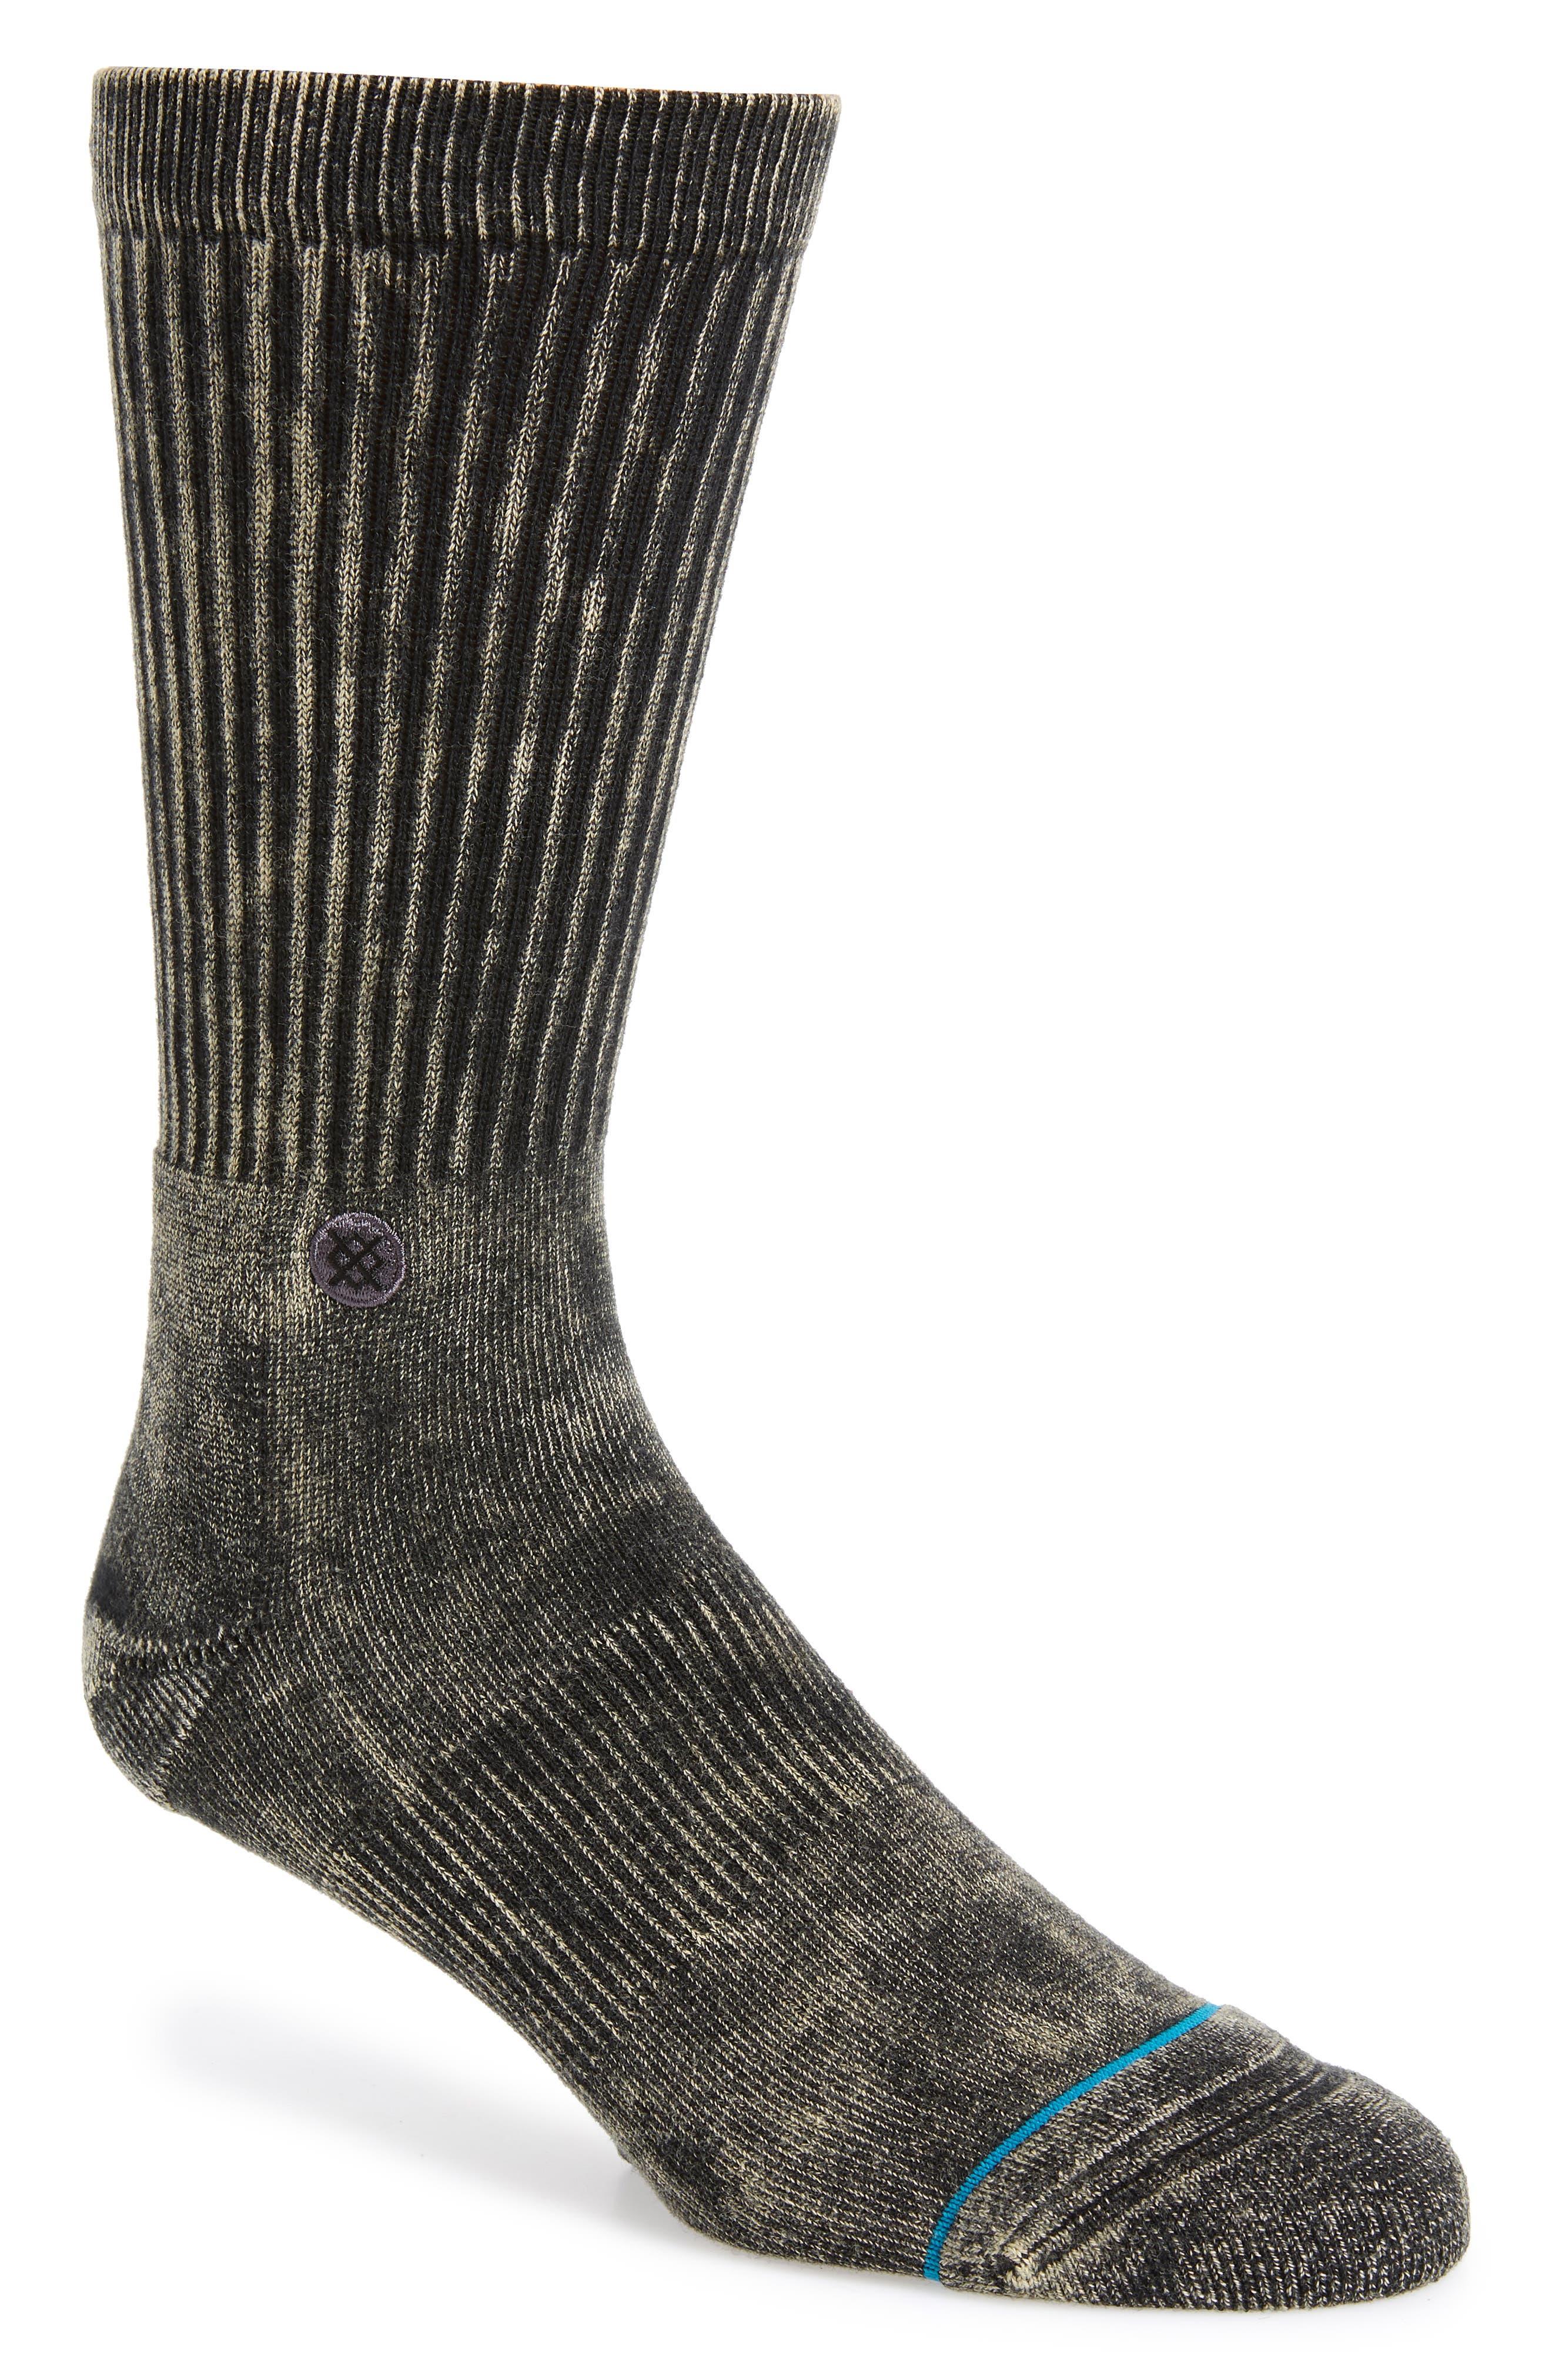 OG 2 Socks,                         Main,                         color, BLACK